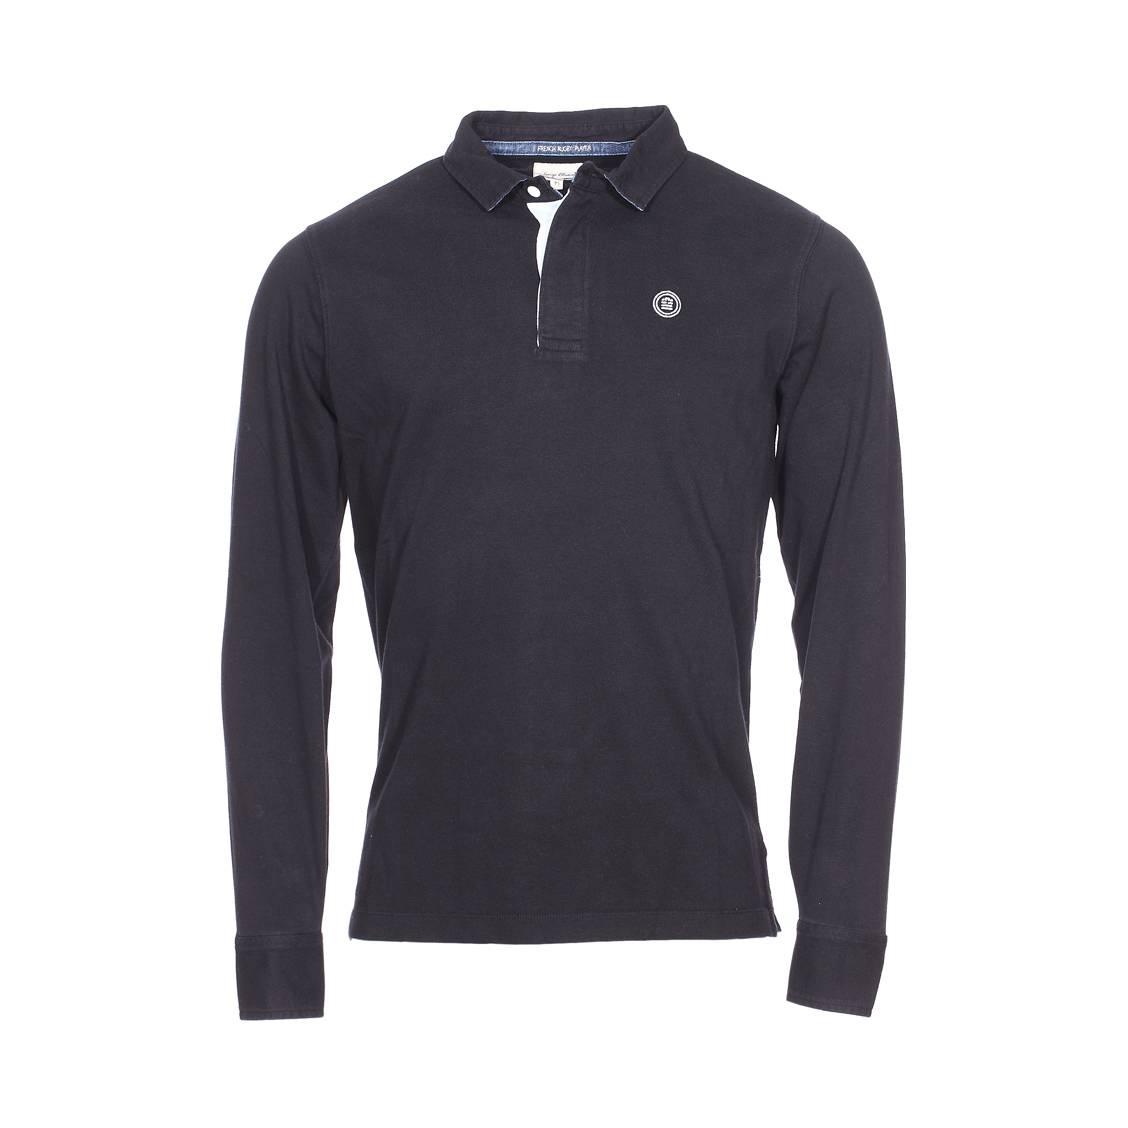 Manches longues Homme, Polo Homme, T-shirt   polo   débardeur Homme ... dac9f684cc35